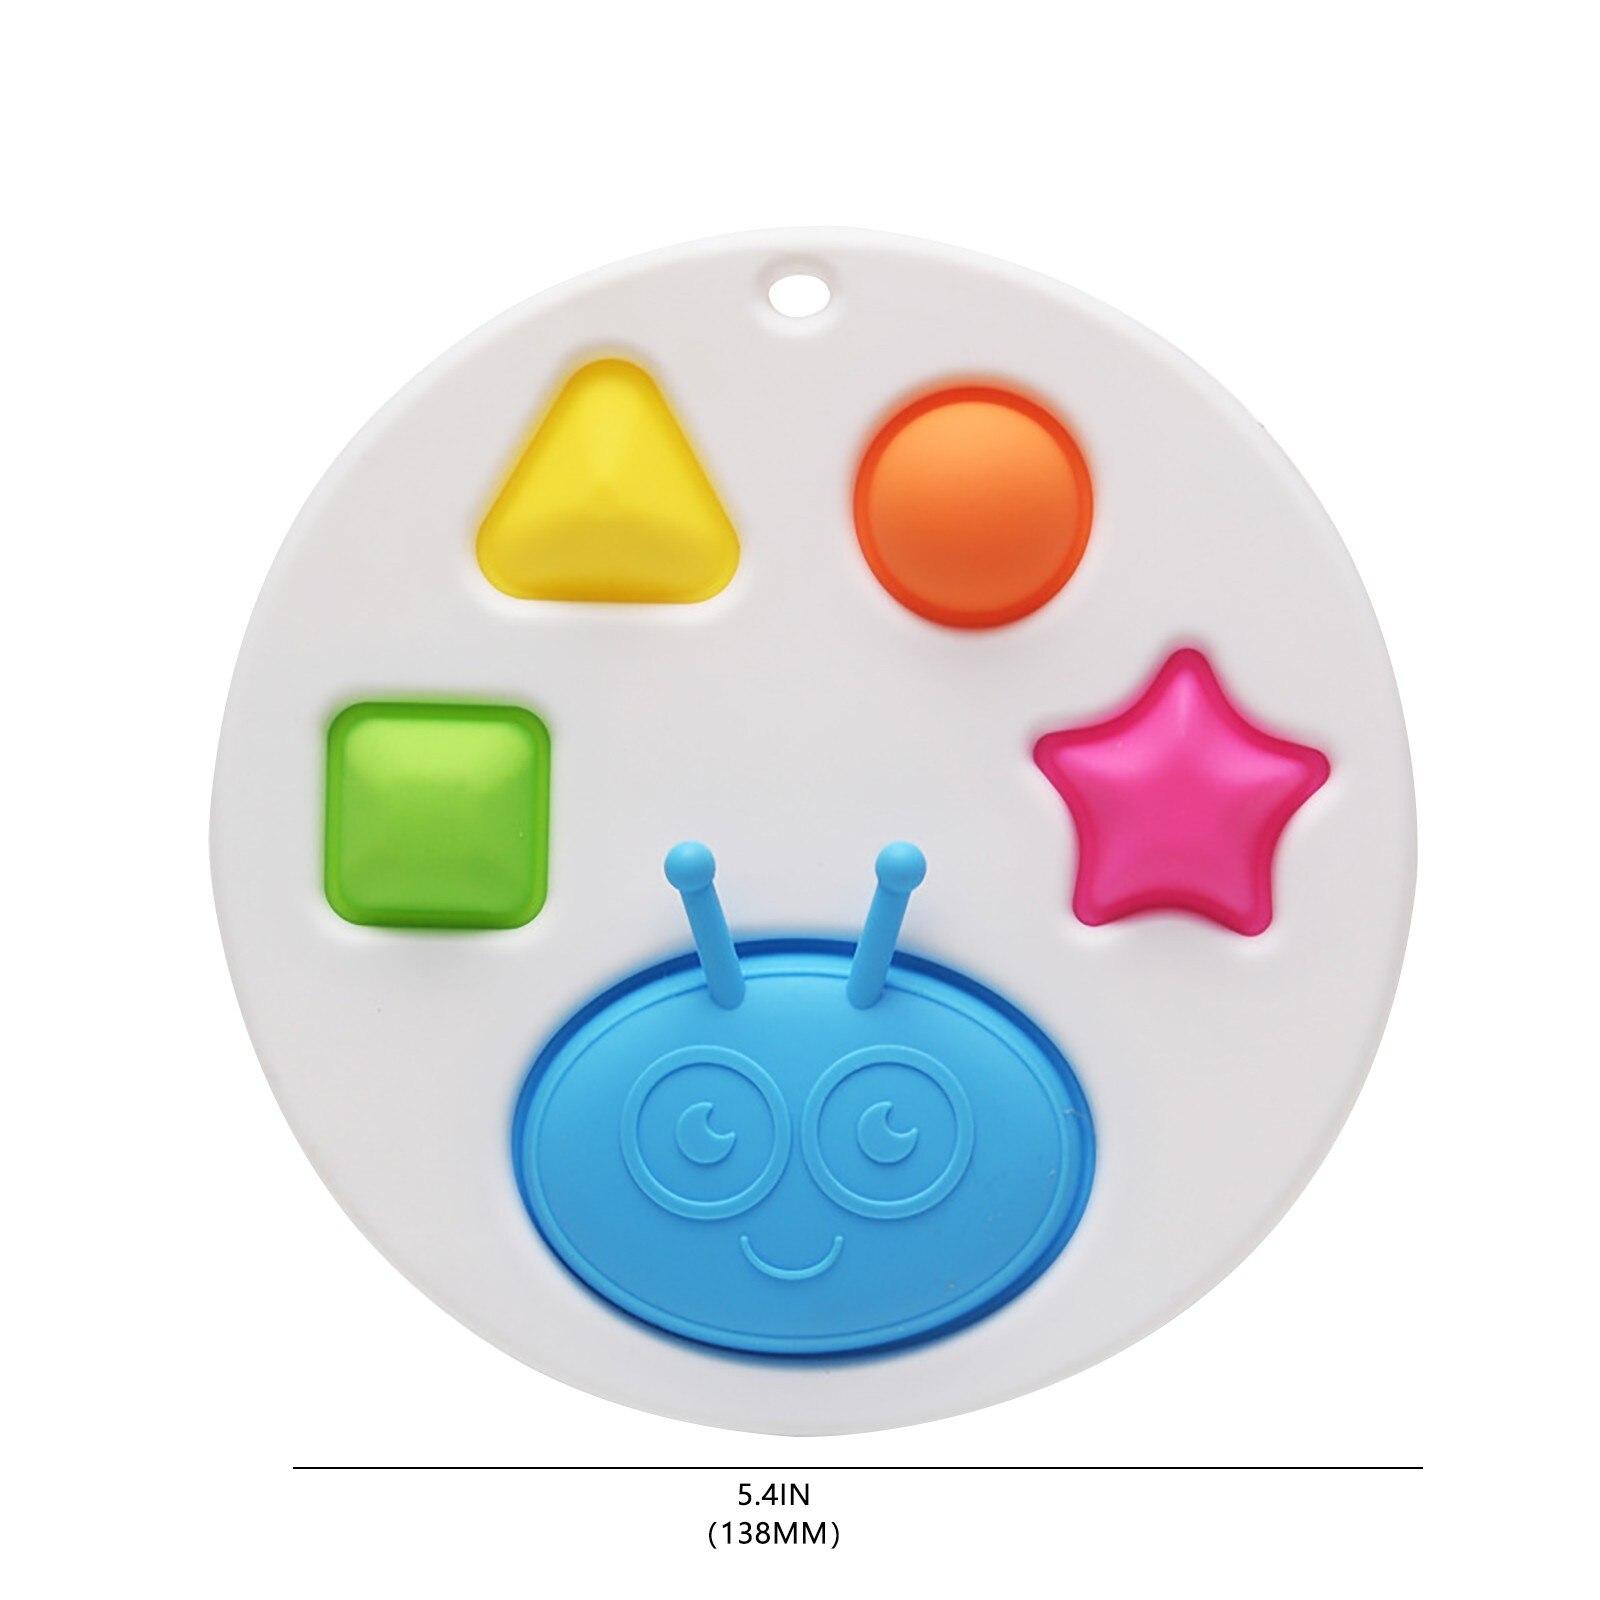 Toy Fidget-Toys Puzzle Baby-Toy Training Simple Dimple It-Sensory Pops Brain-Development-Enlightenment img5